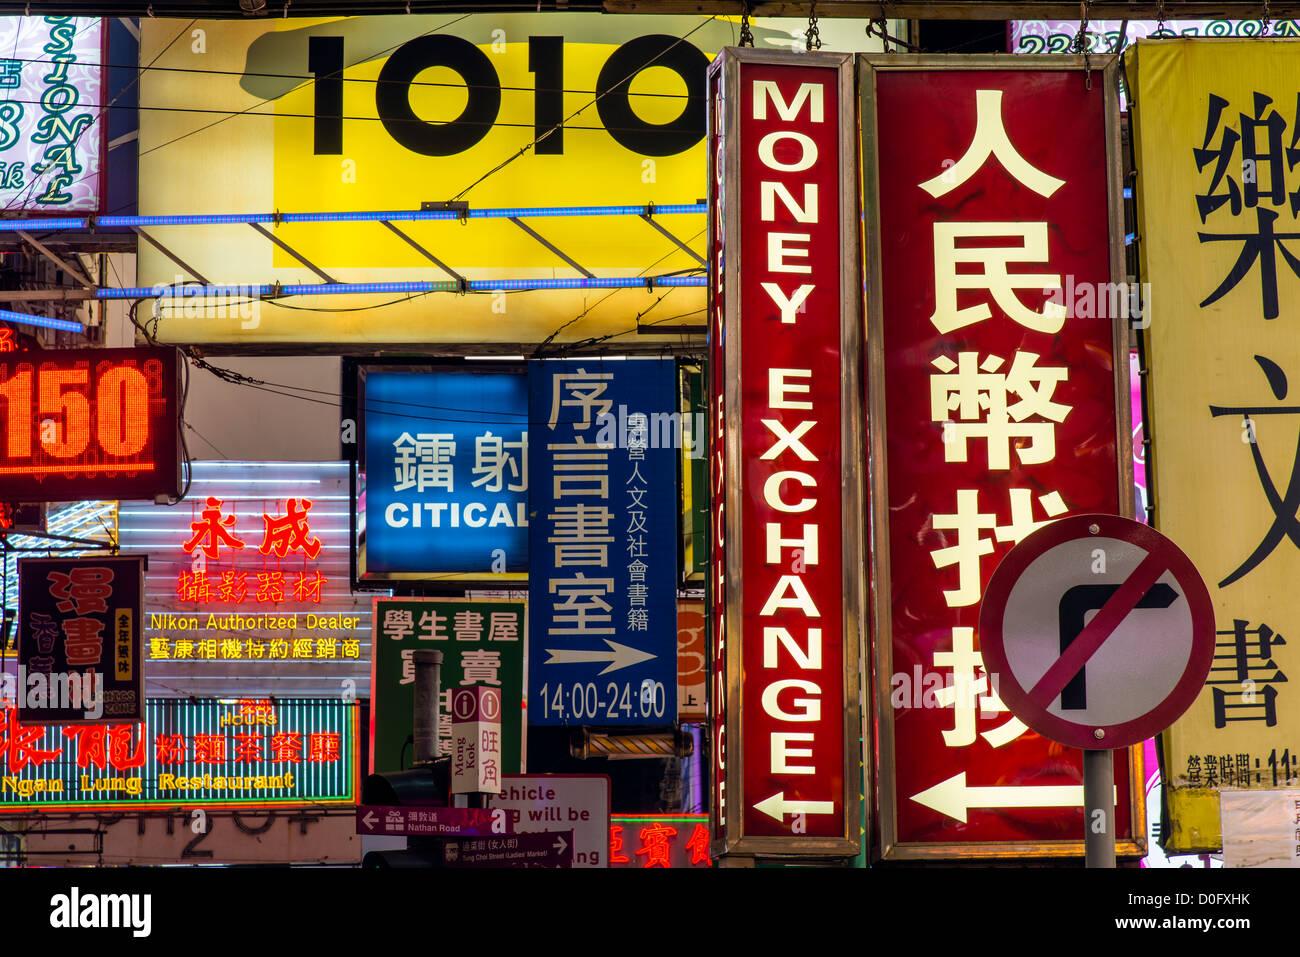 Night view of chinese neon signs at Mong Kok neighborhood in Kowloon, Hong Kong, China - Stock Image